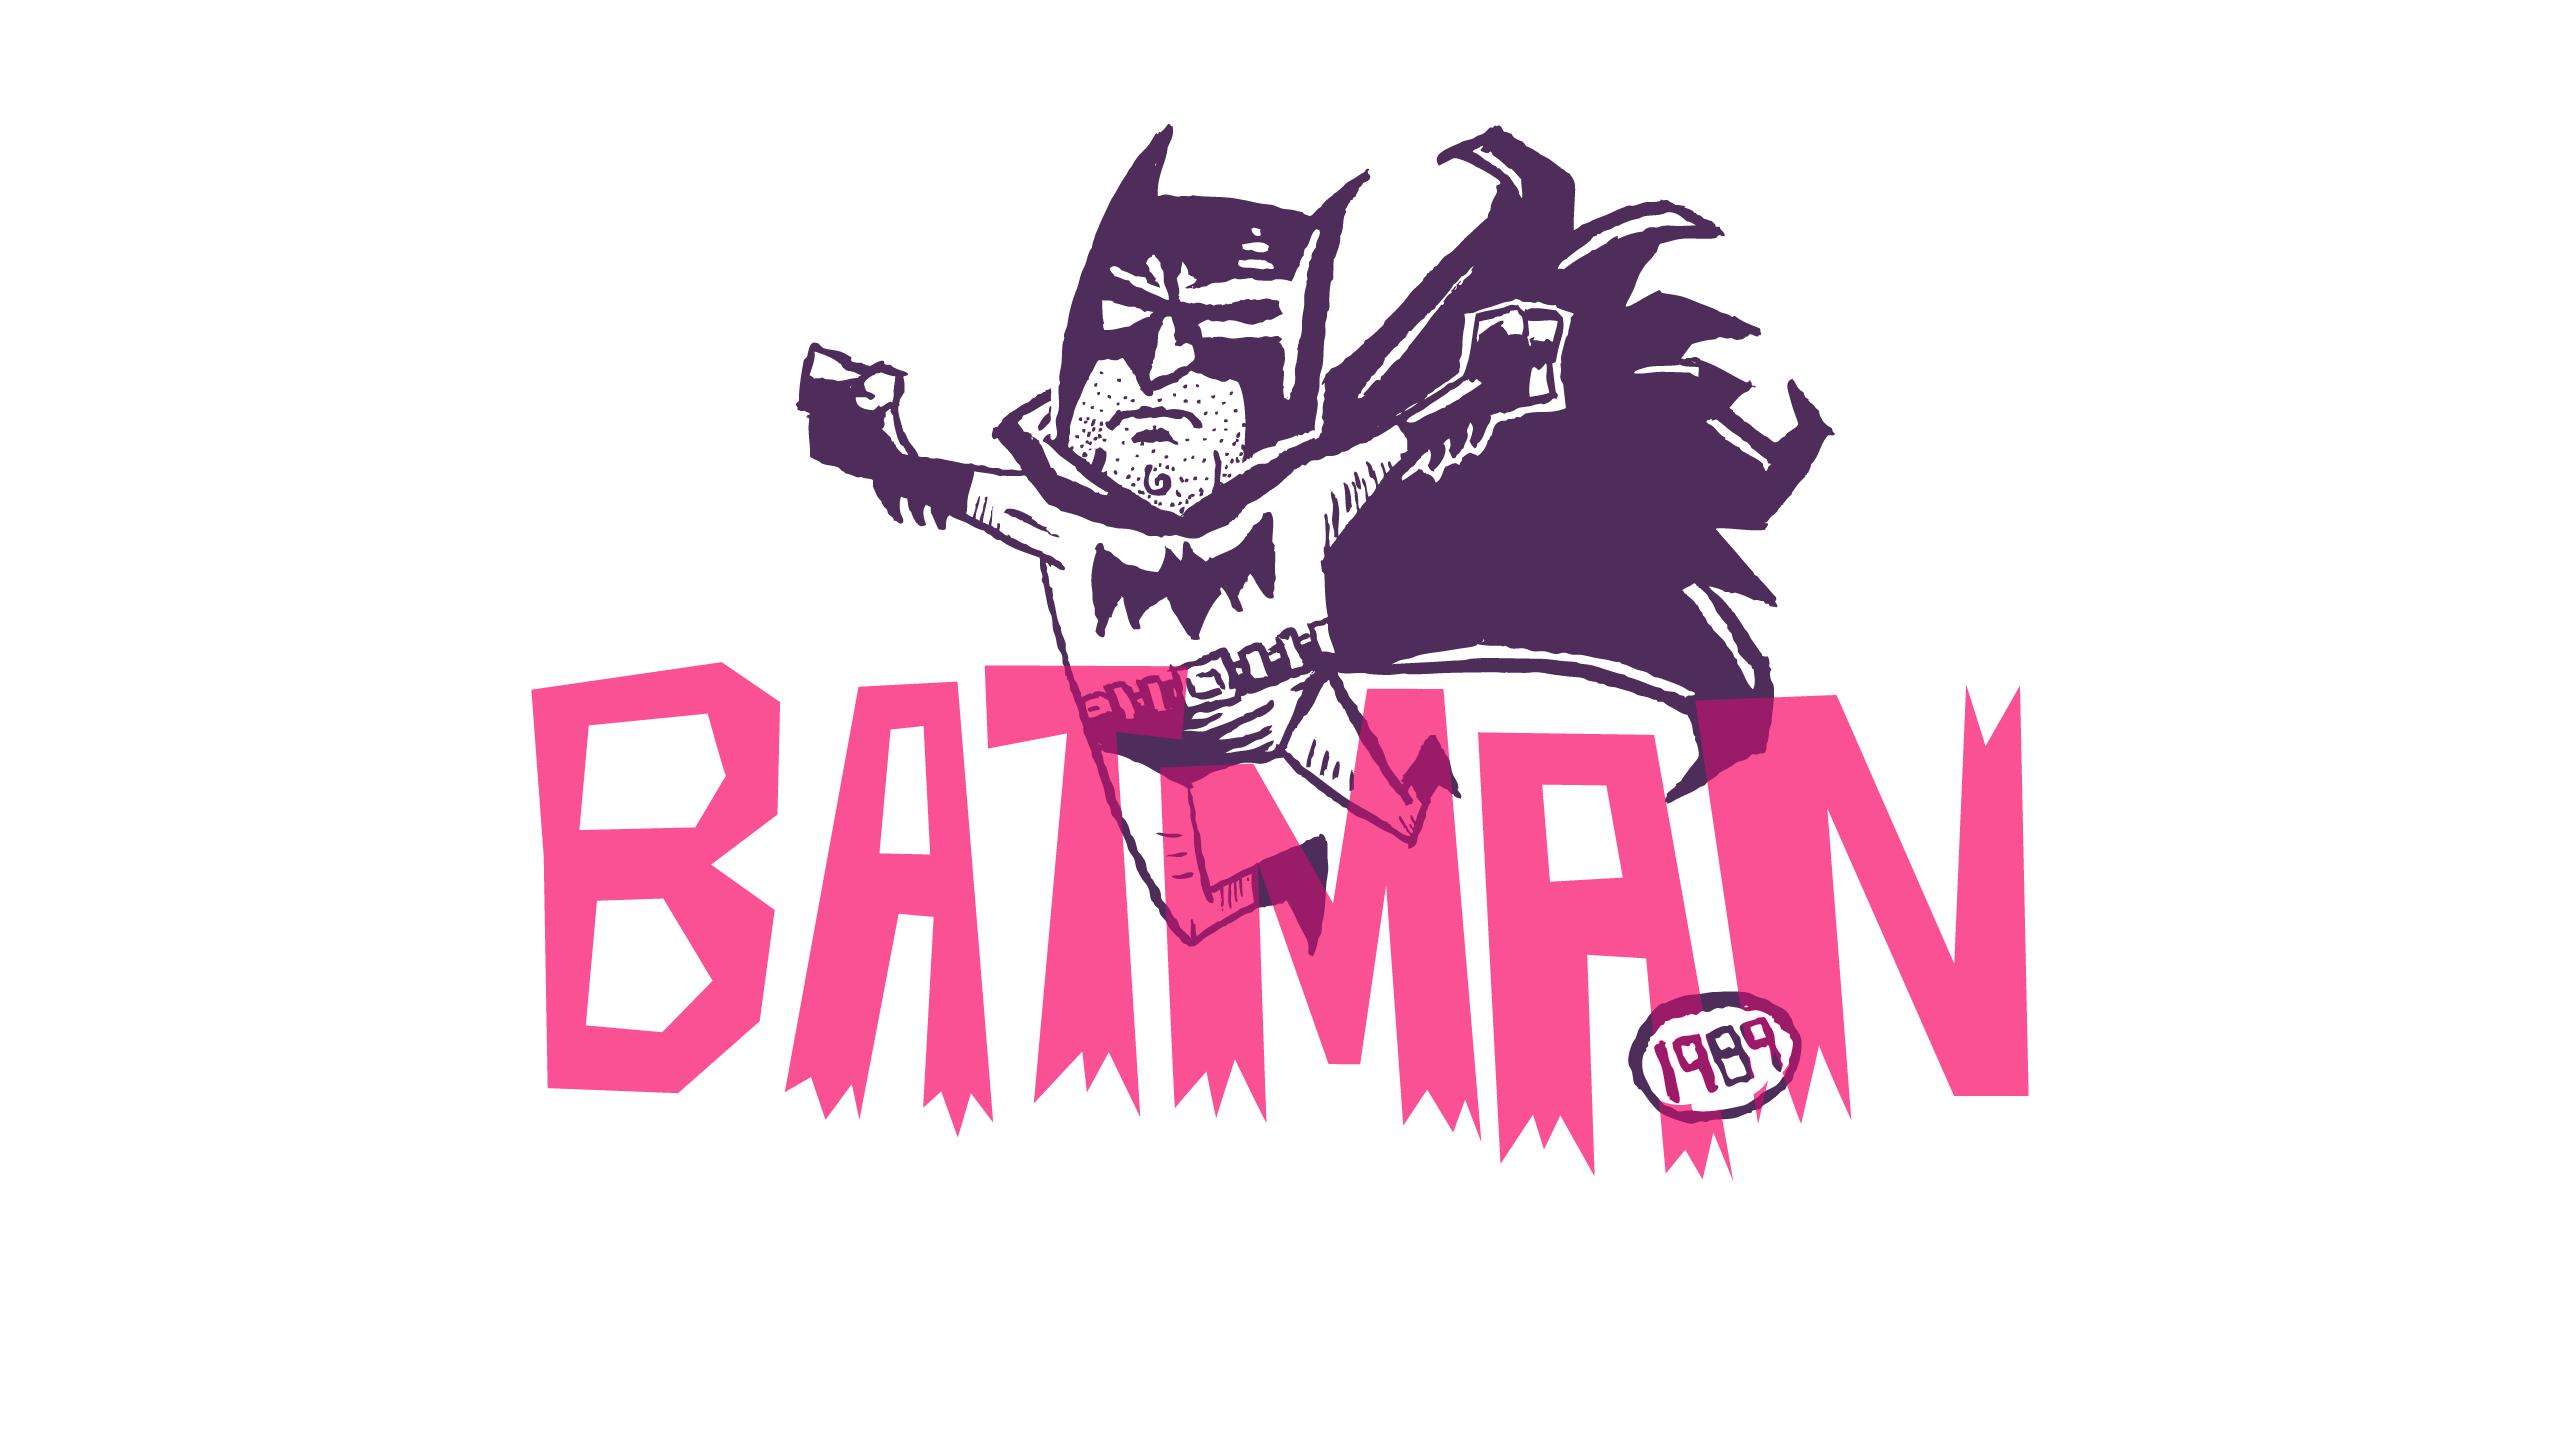 Batman ryan putnam wallpaper